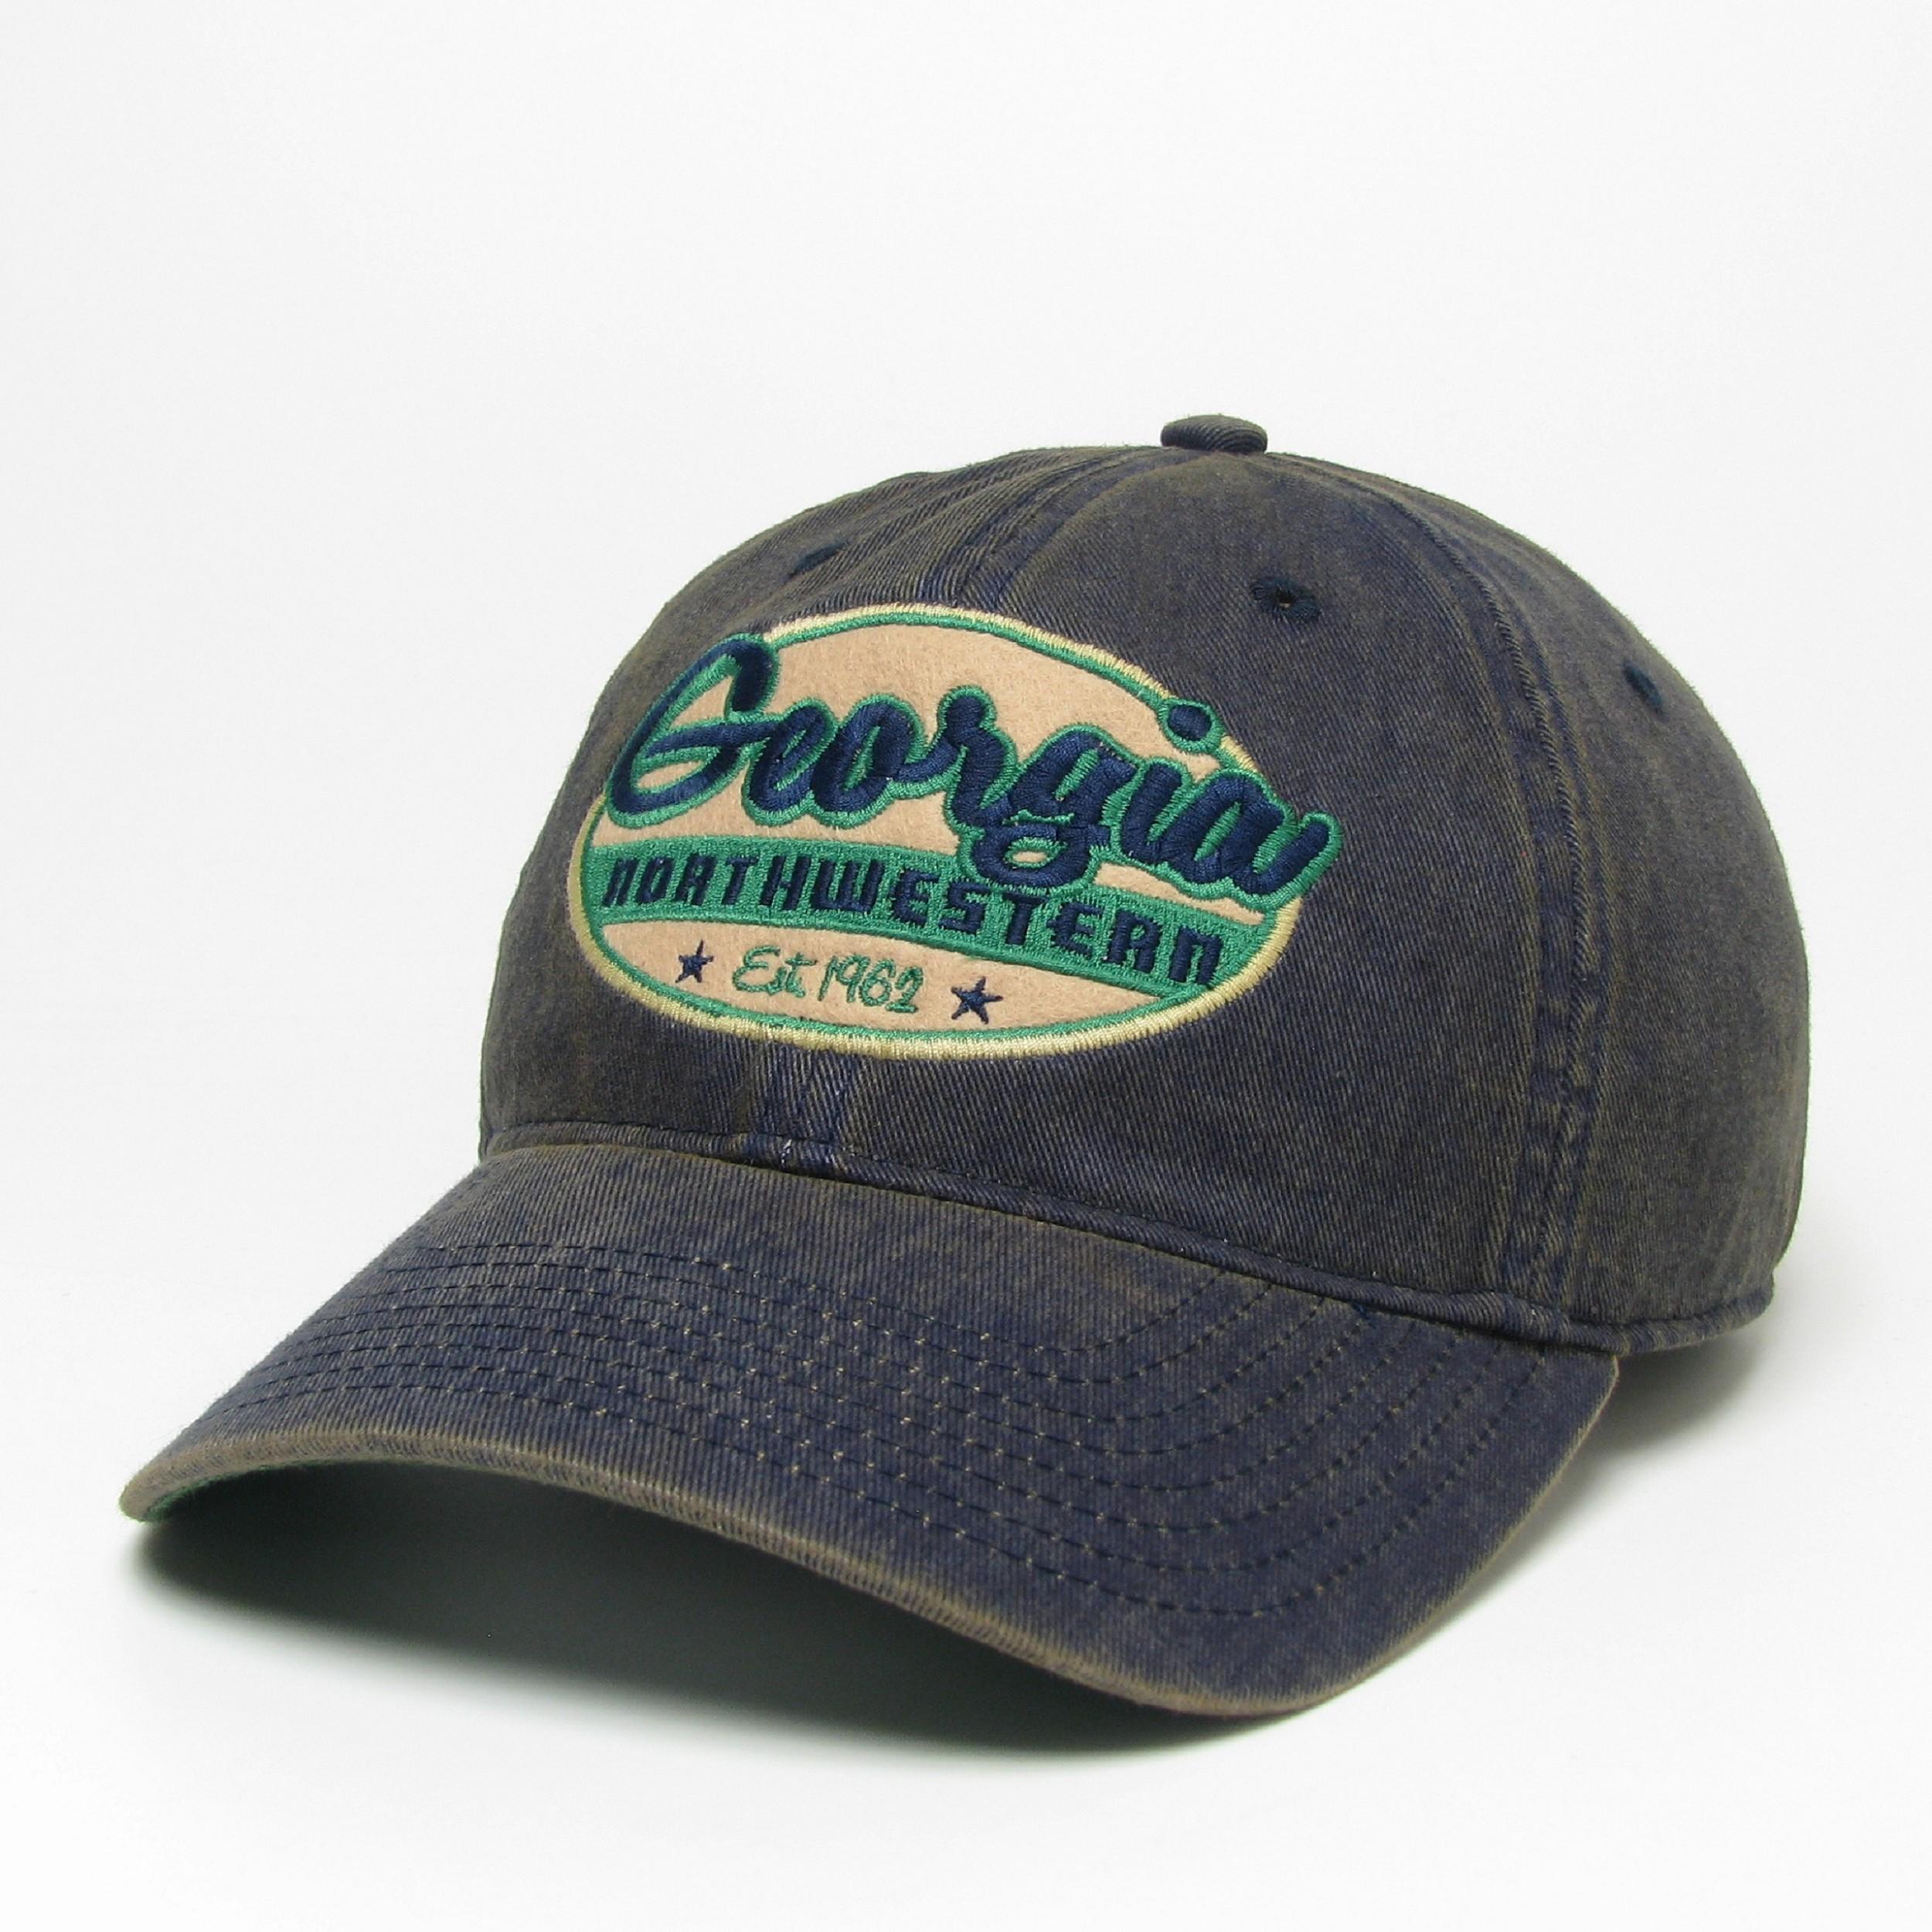 Georgia Northwestern Est. 1962 Old Favorite Hat